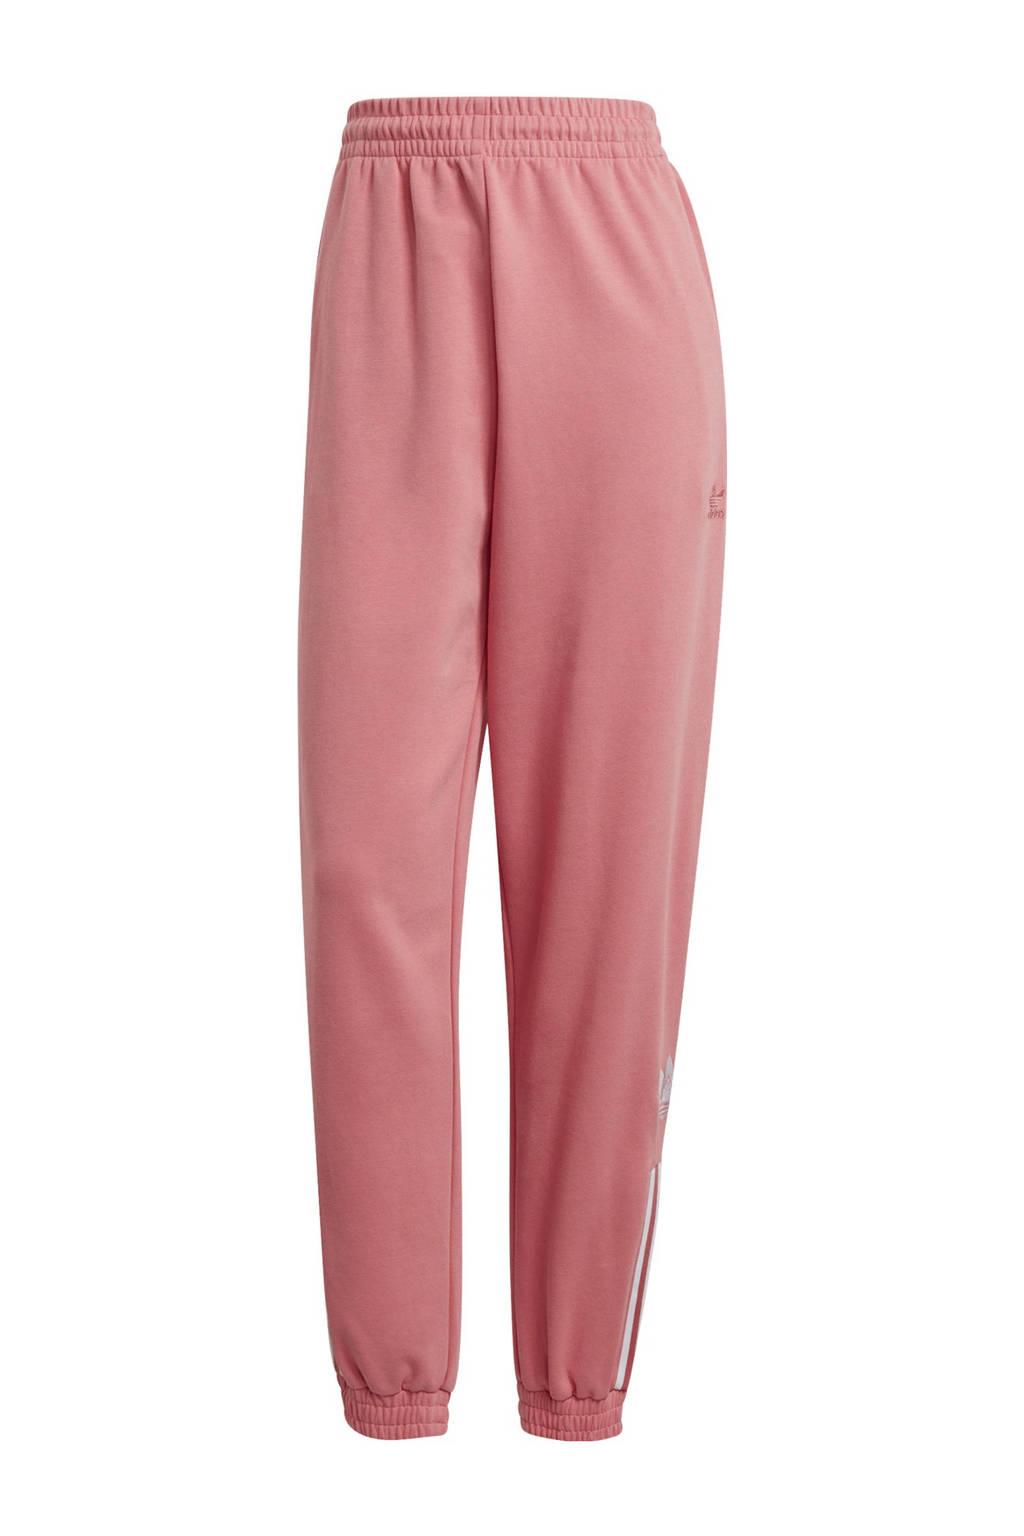 adidas Originals Adicolor joggingbroek roze/wit, Roze/wit